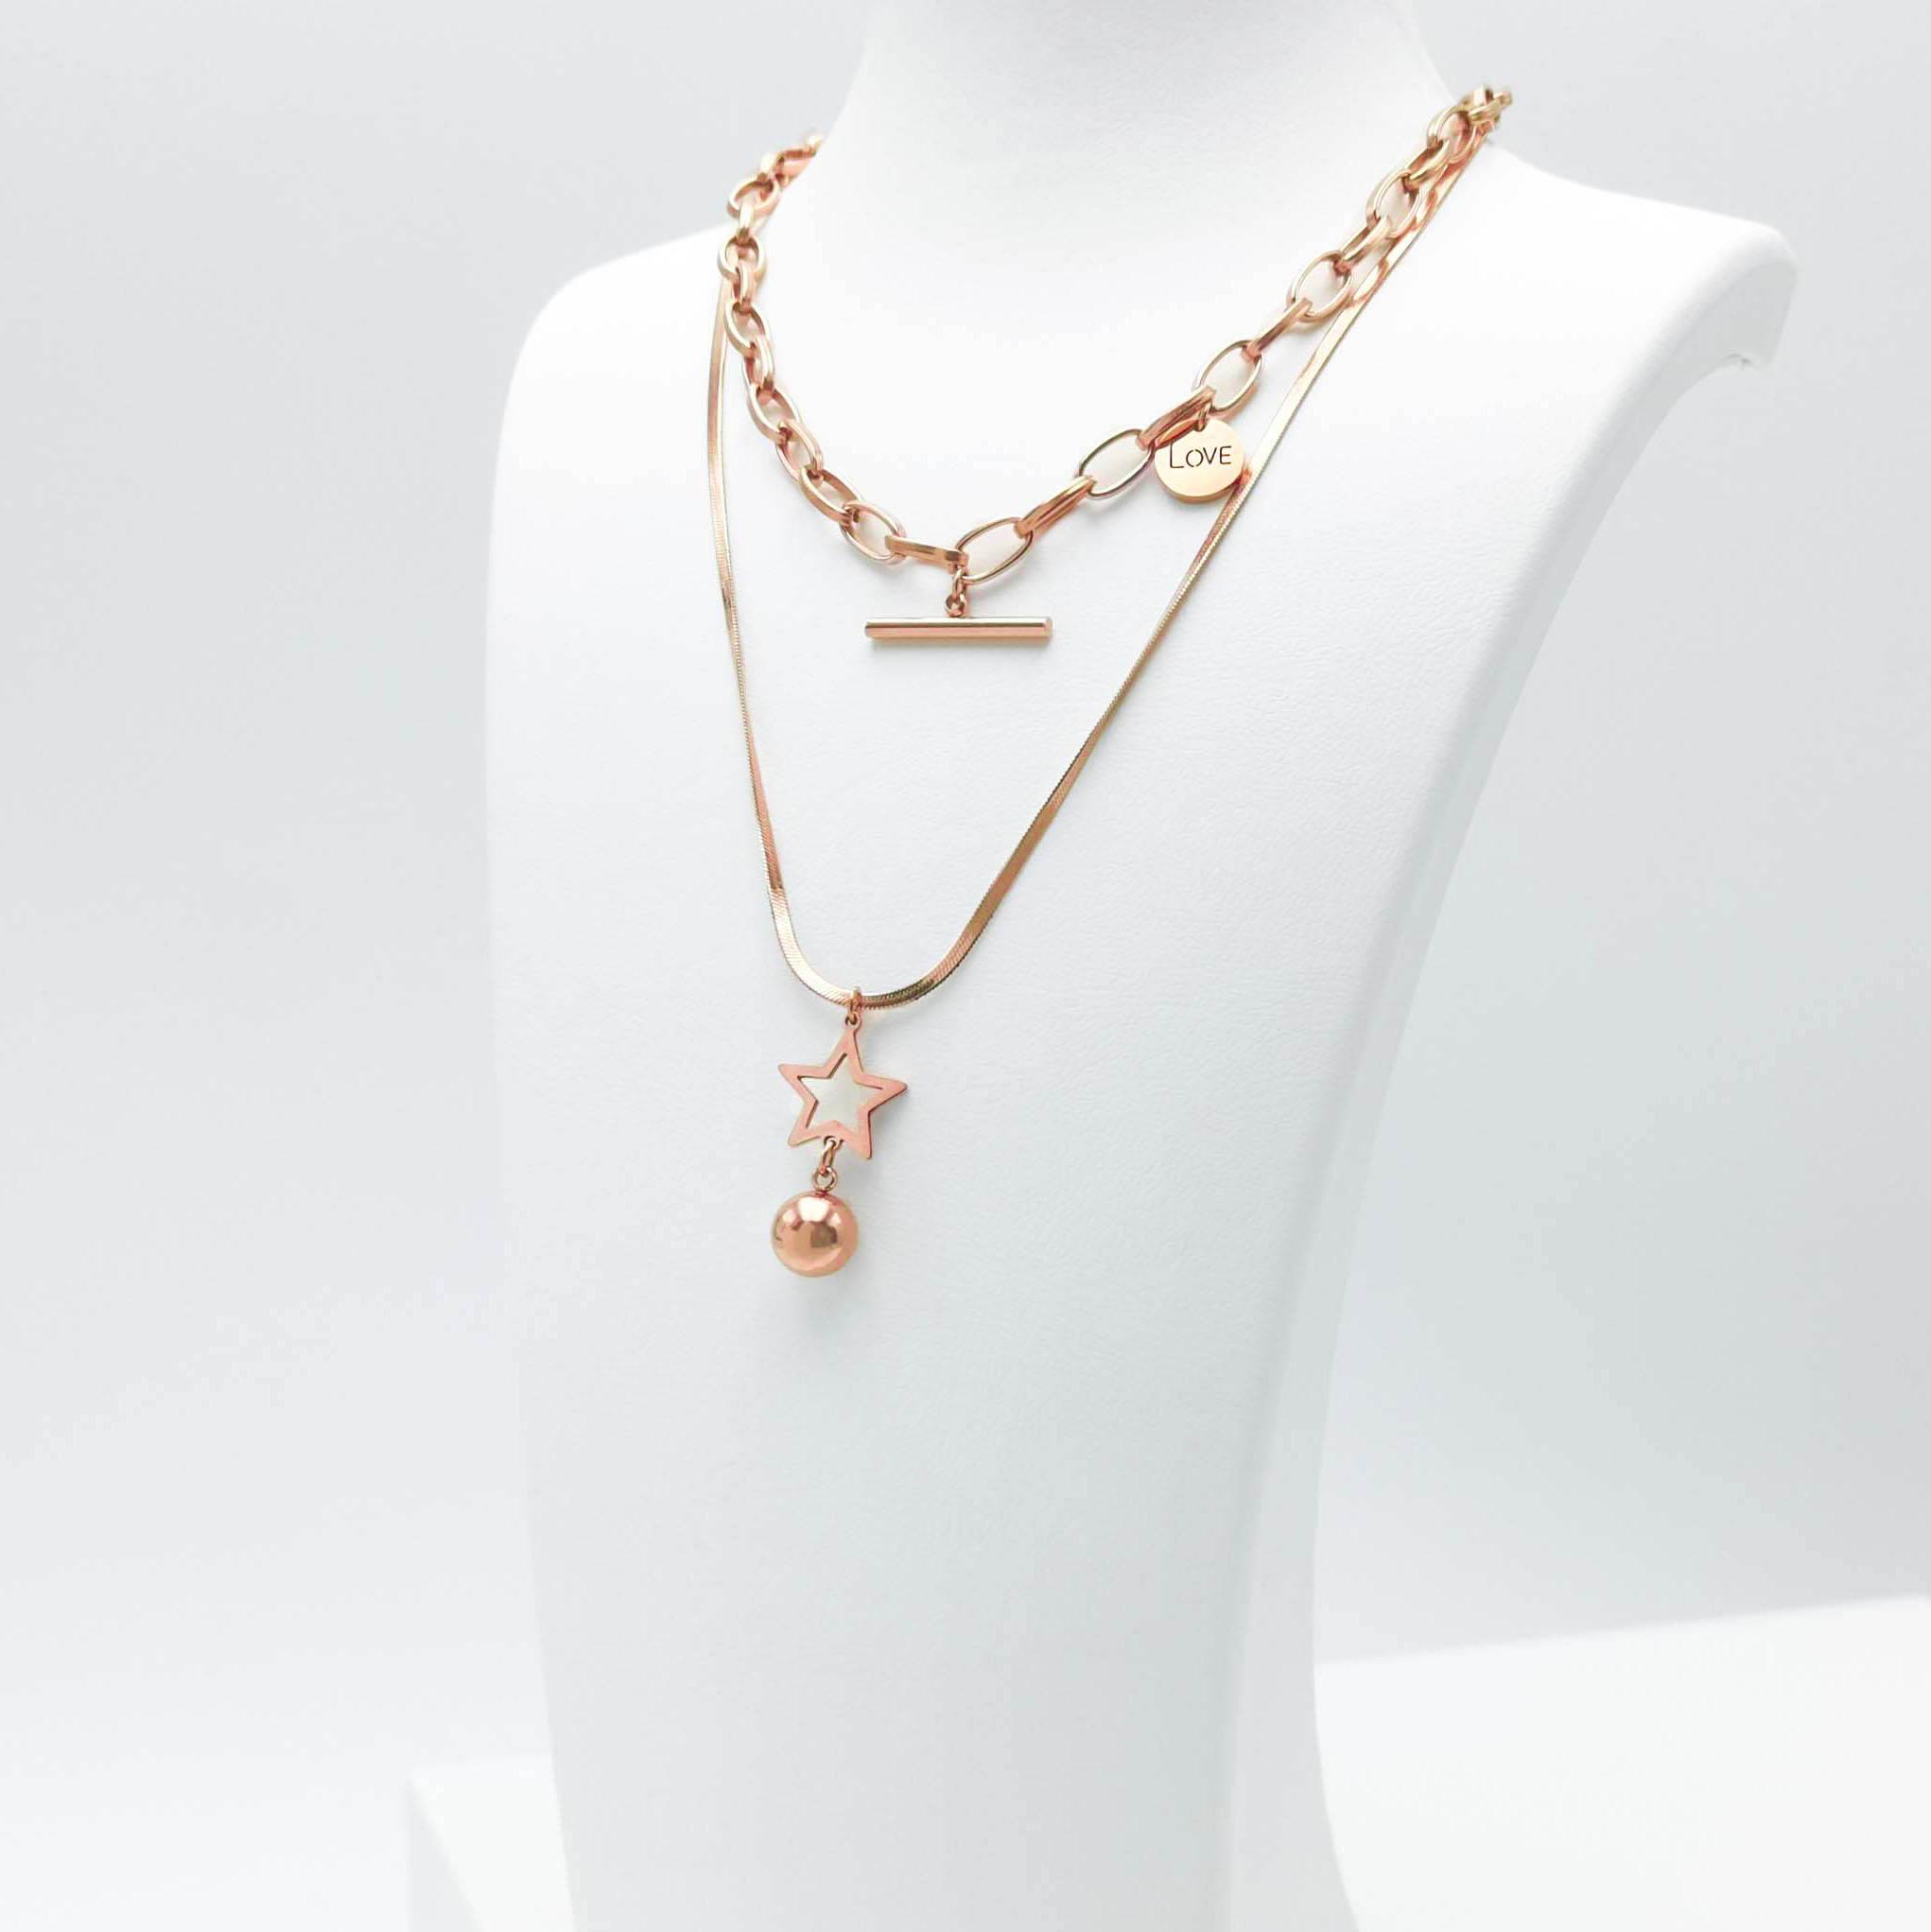 Full Of Love bild 2 Dam halsband. Modern, stilren och exklusive Smycke.